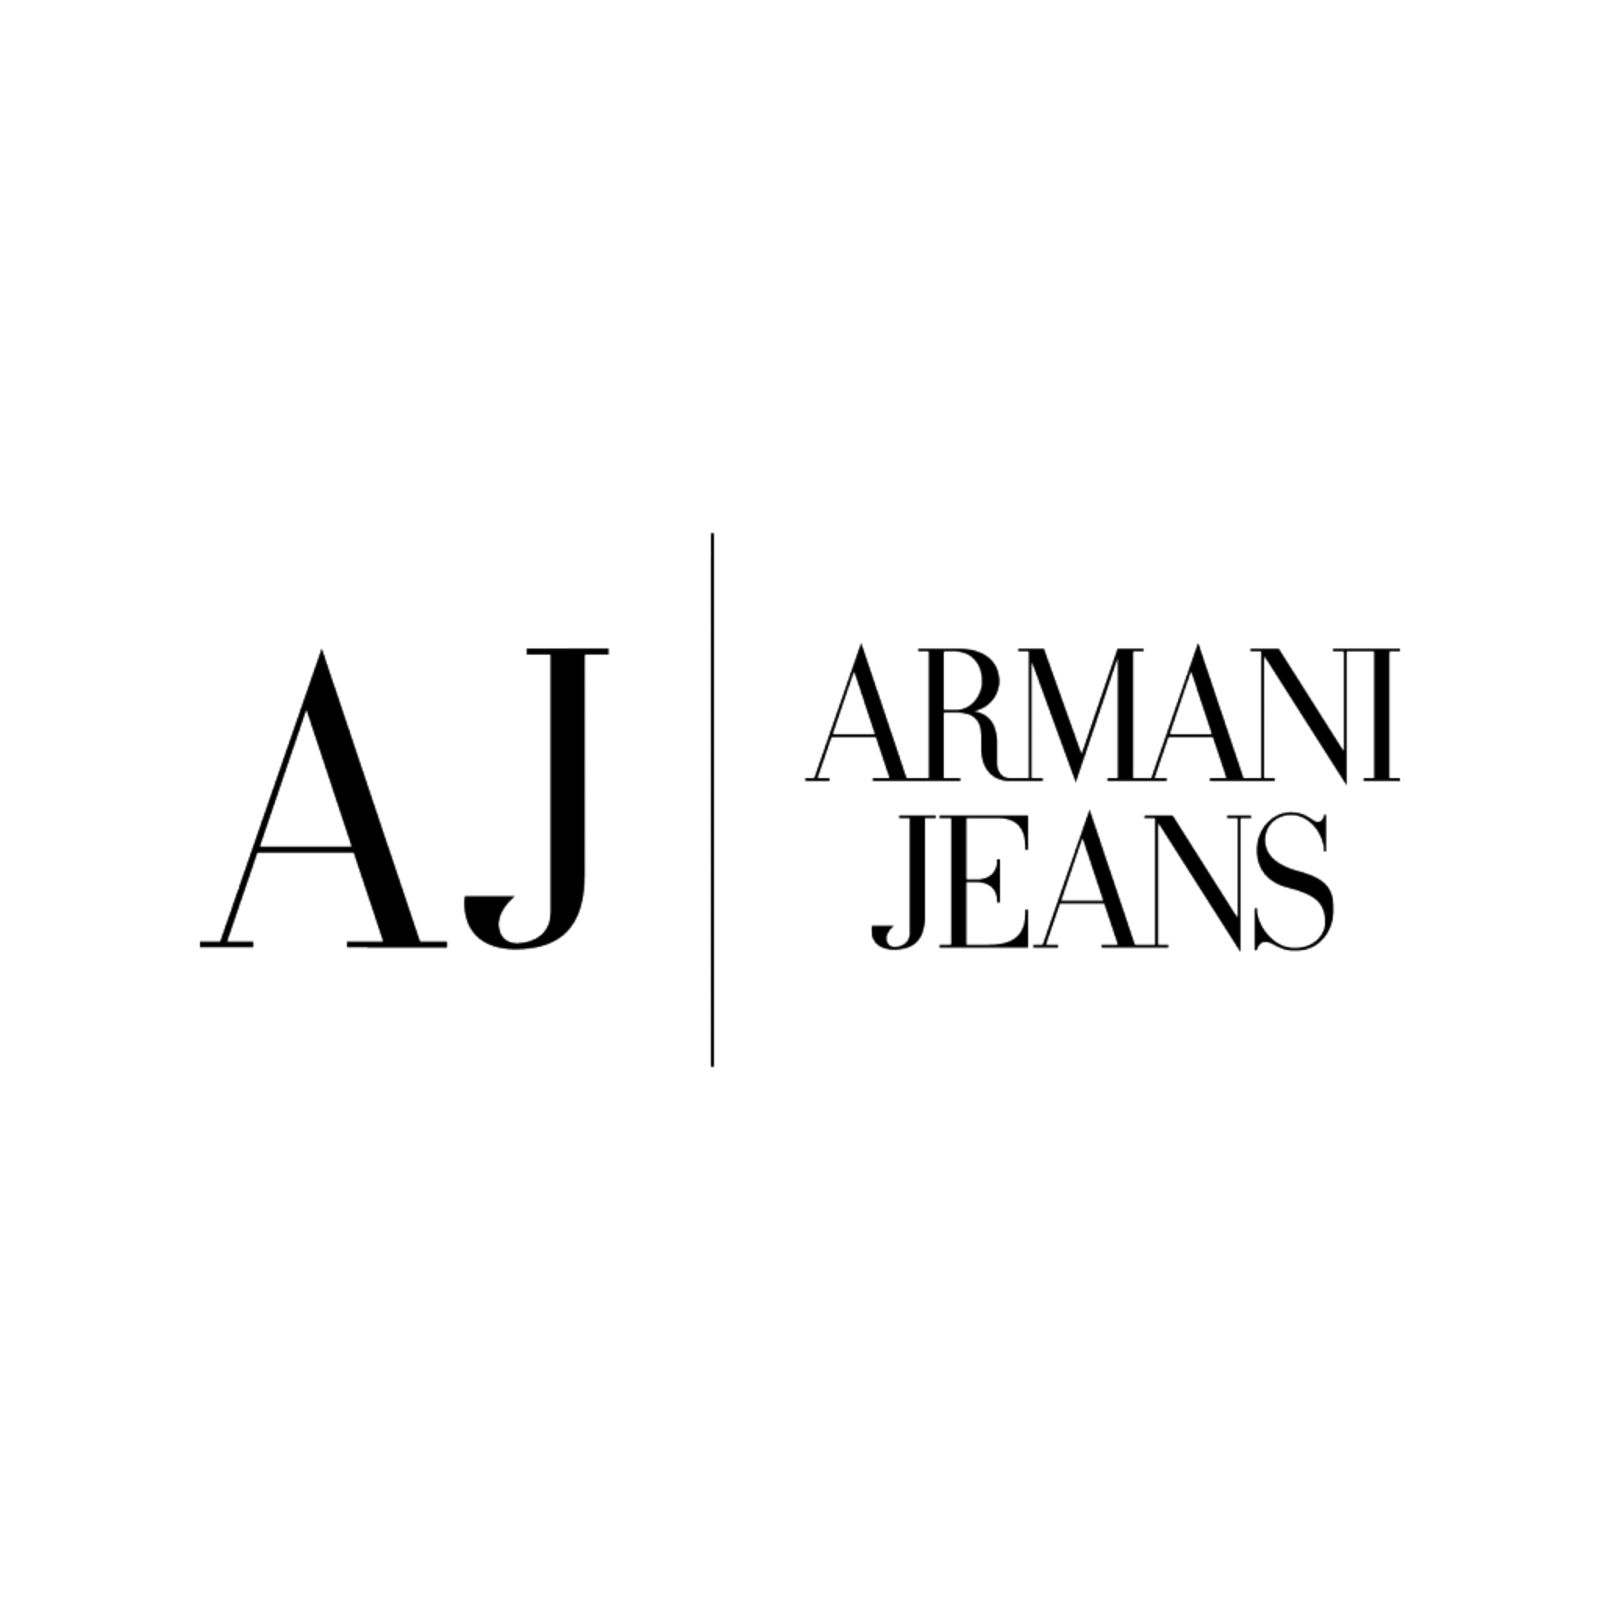 ARMANI JEANS (Image 1)